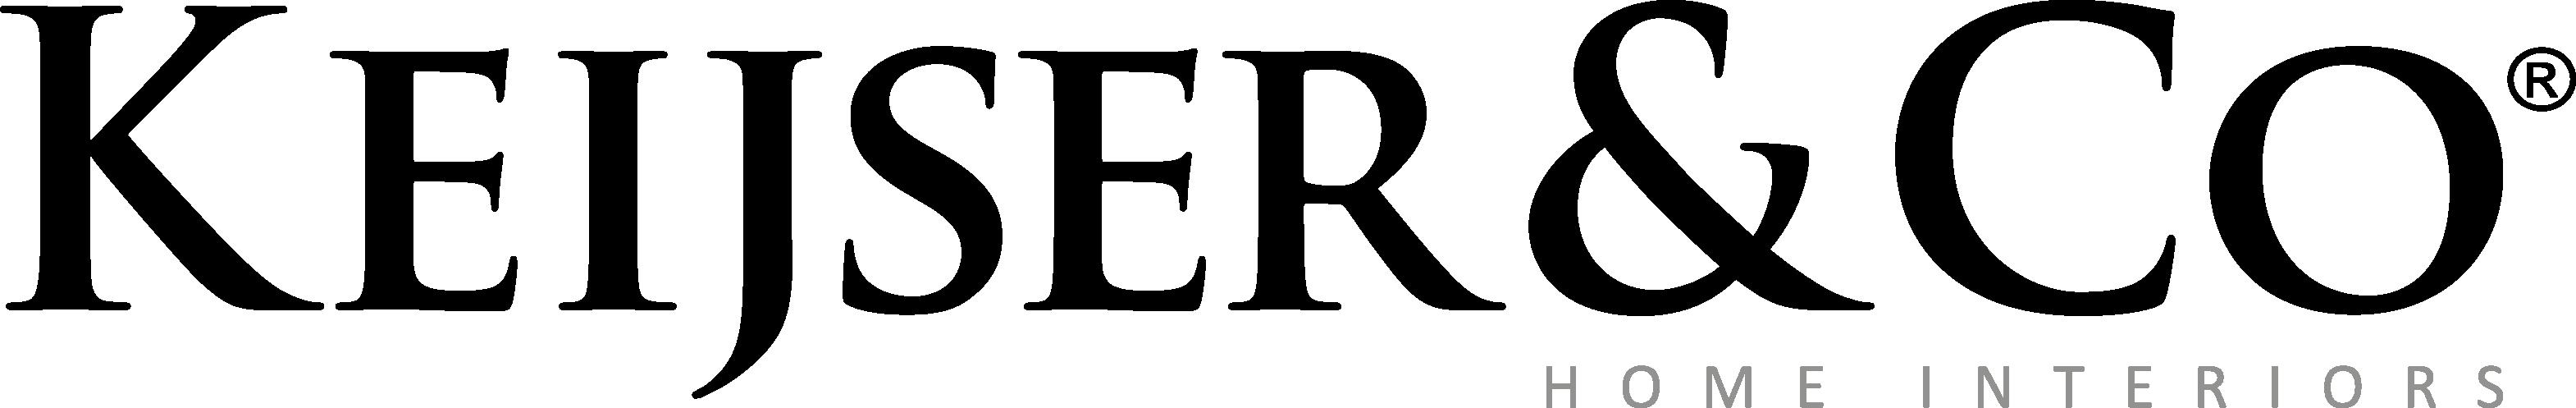 https://fashionunited.nl/logos/kec_homeinteriors_logo_origineel_zwartgrijs.FqvEMxY5PXXF6GmwZ.png